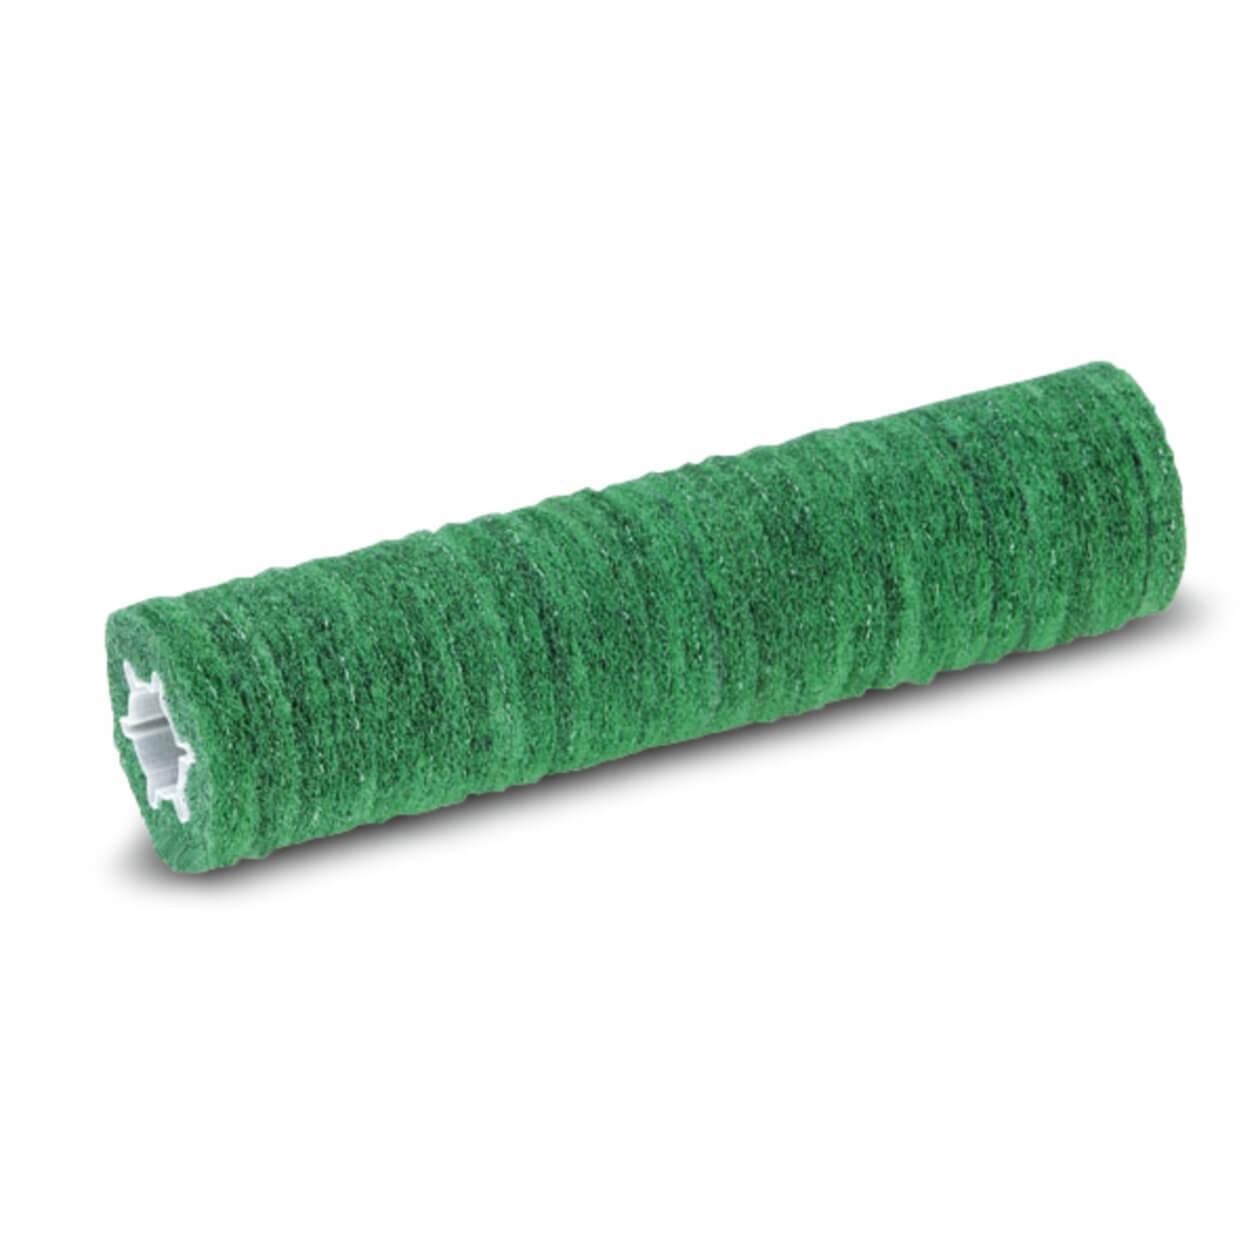 Kärcher, Grøn valsepad til BR 35/12